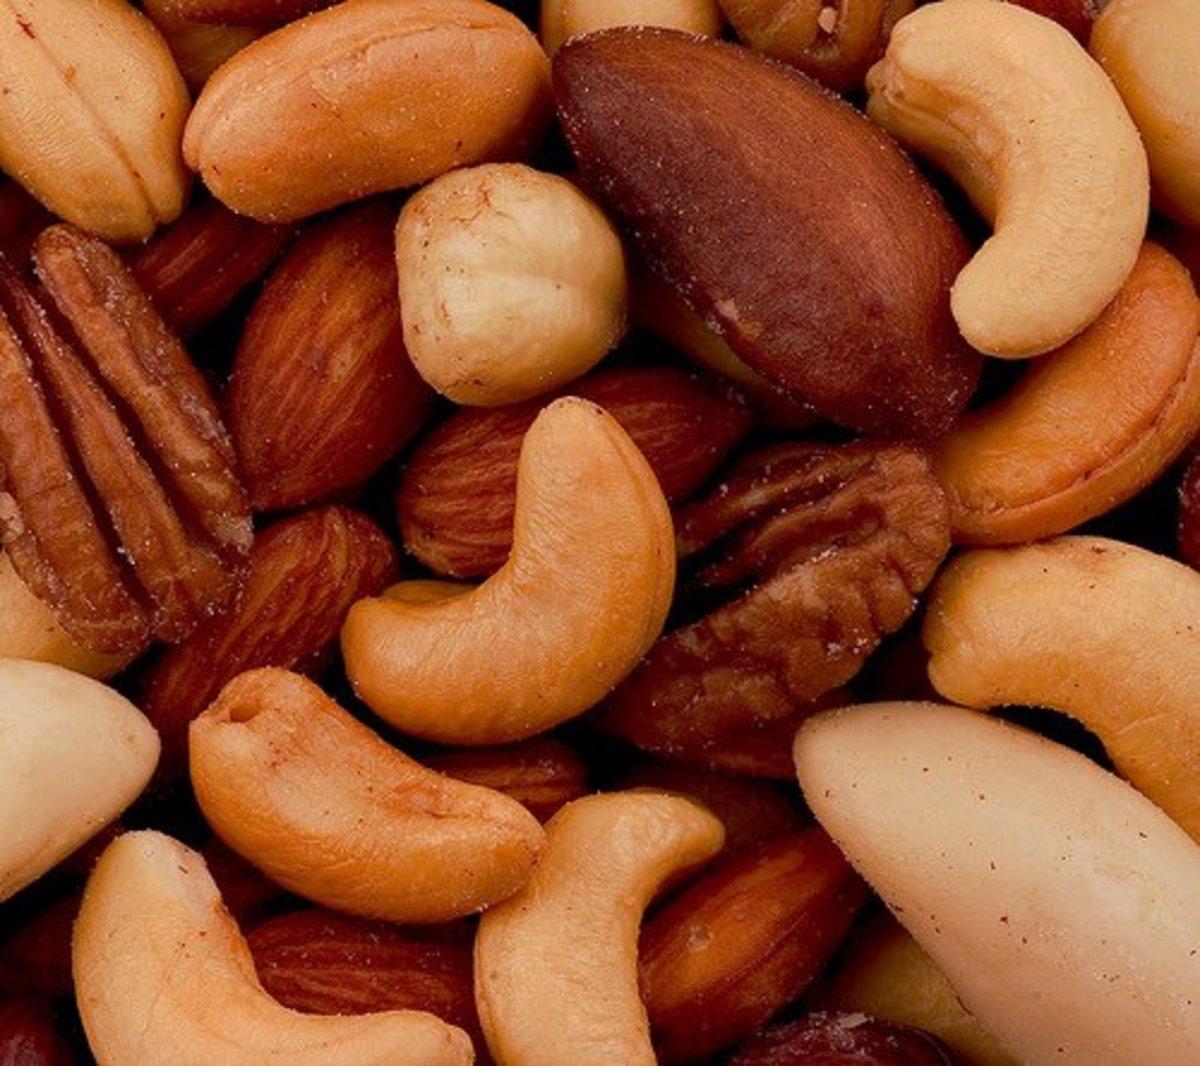 Nuts, a source of Vitamin E